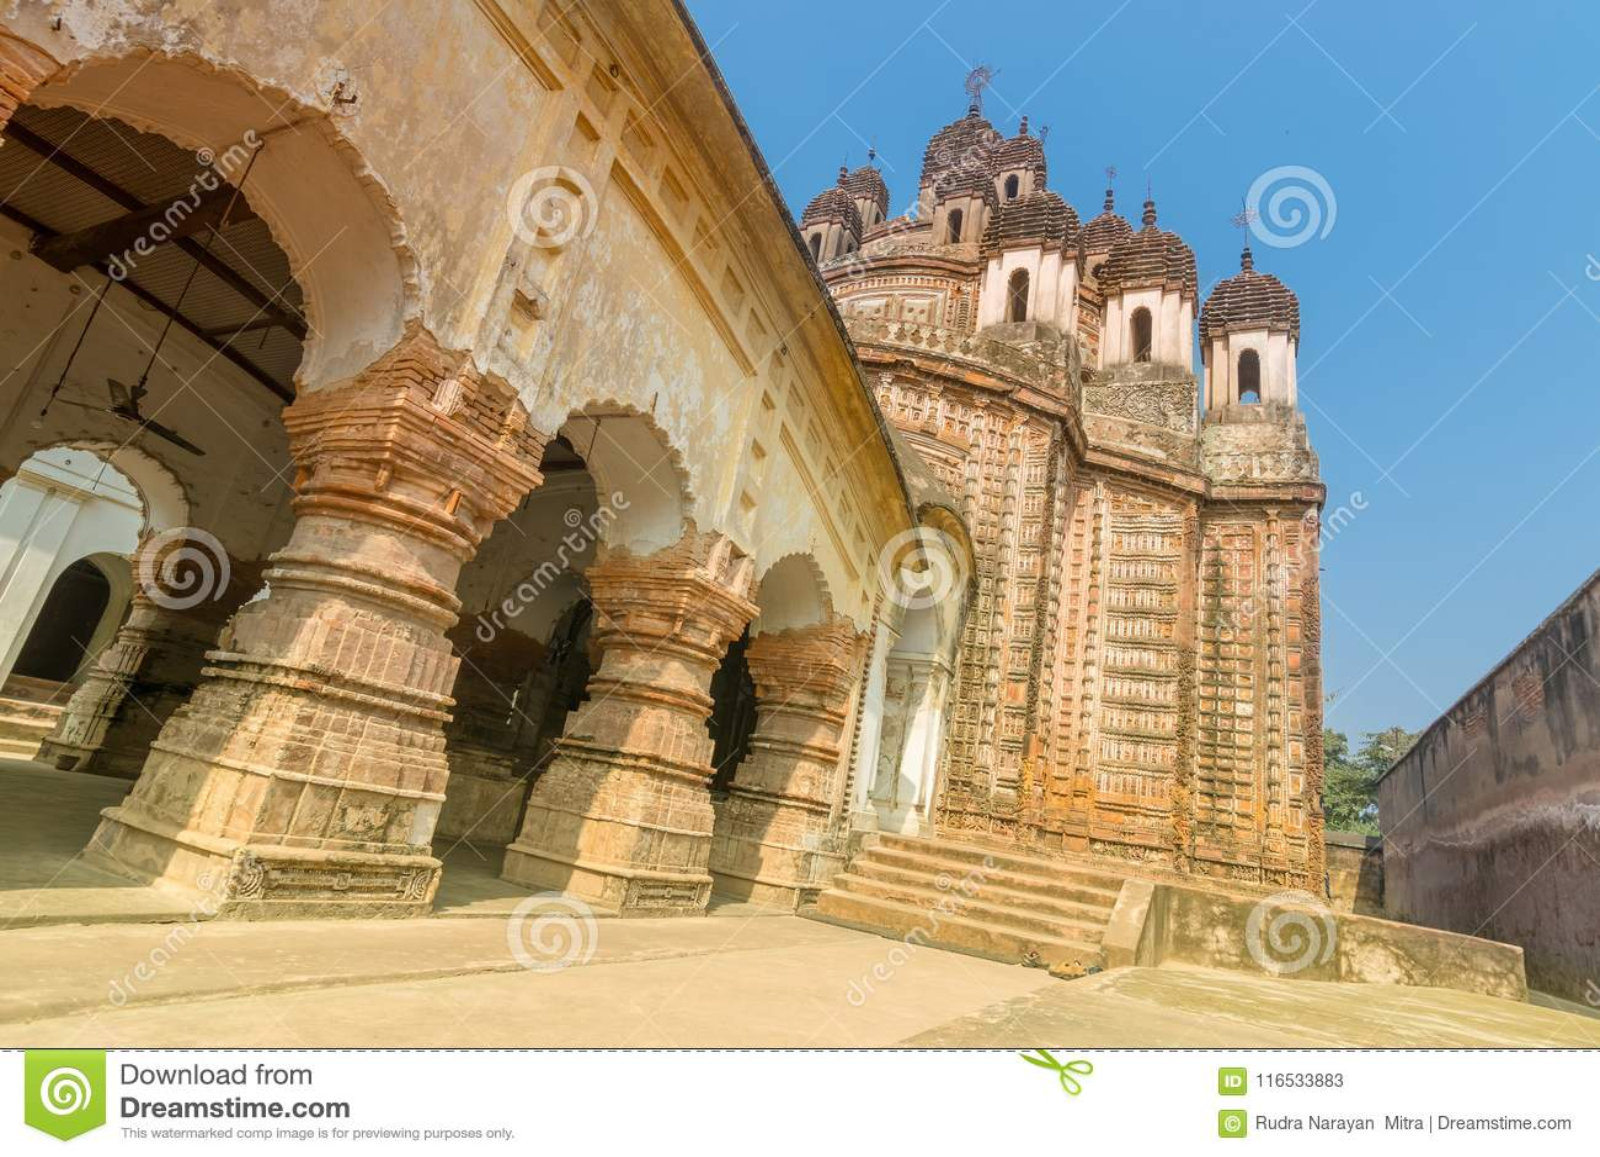 Lalji temple, Kalna stock image  Image of monument, hinduism